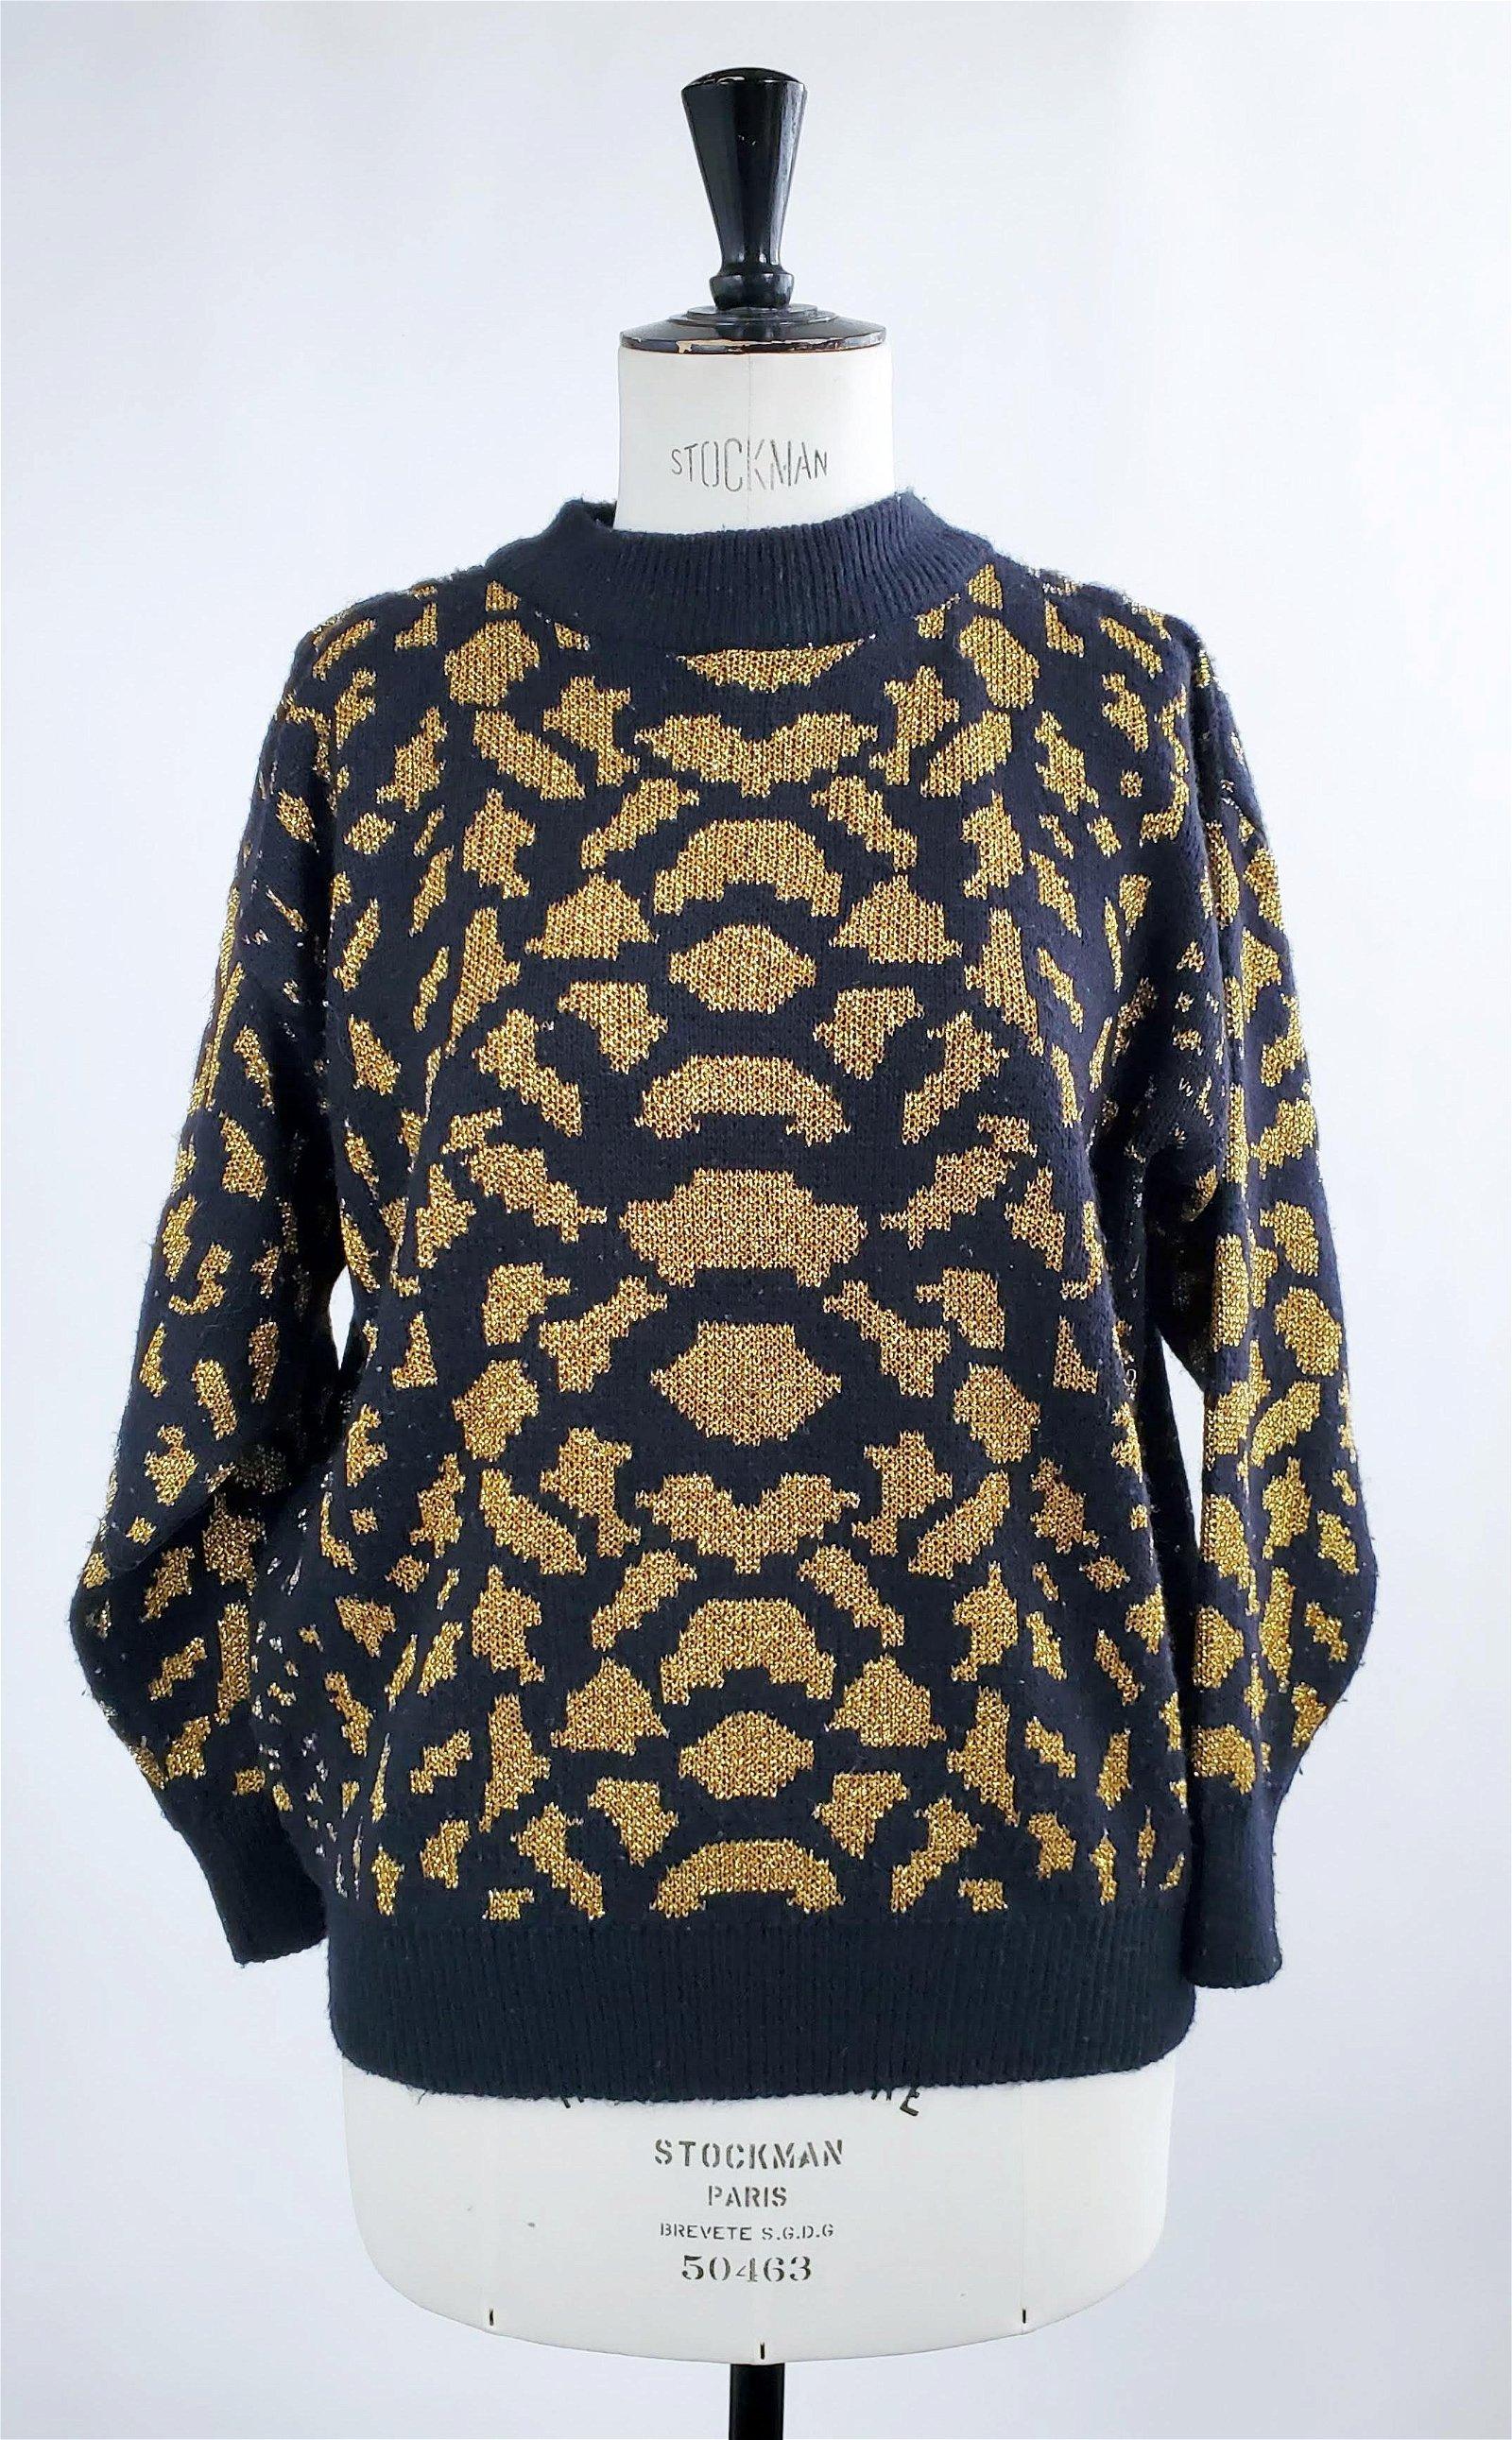 Kansai Yamamoto Black Wool & Gold Lurex Sweater, c1990s